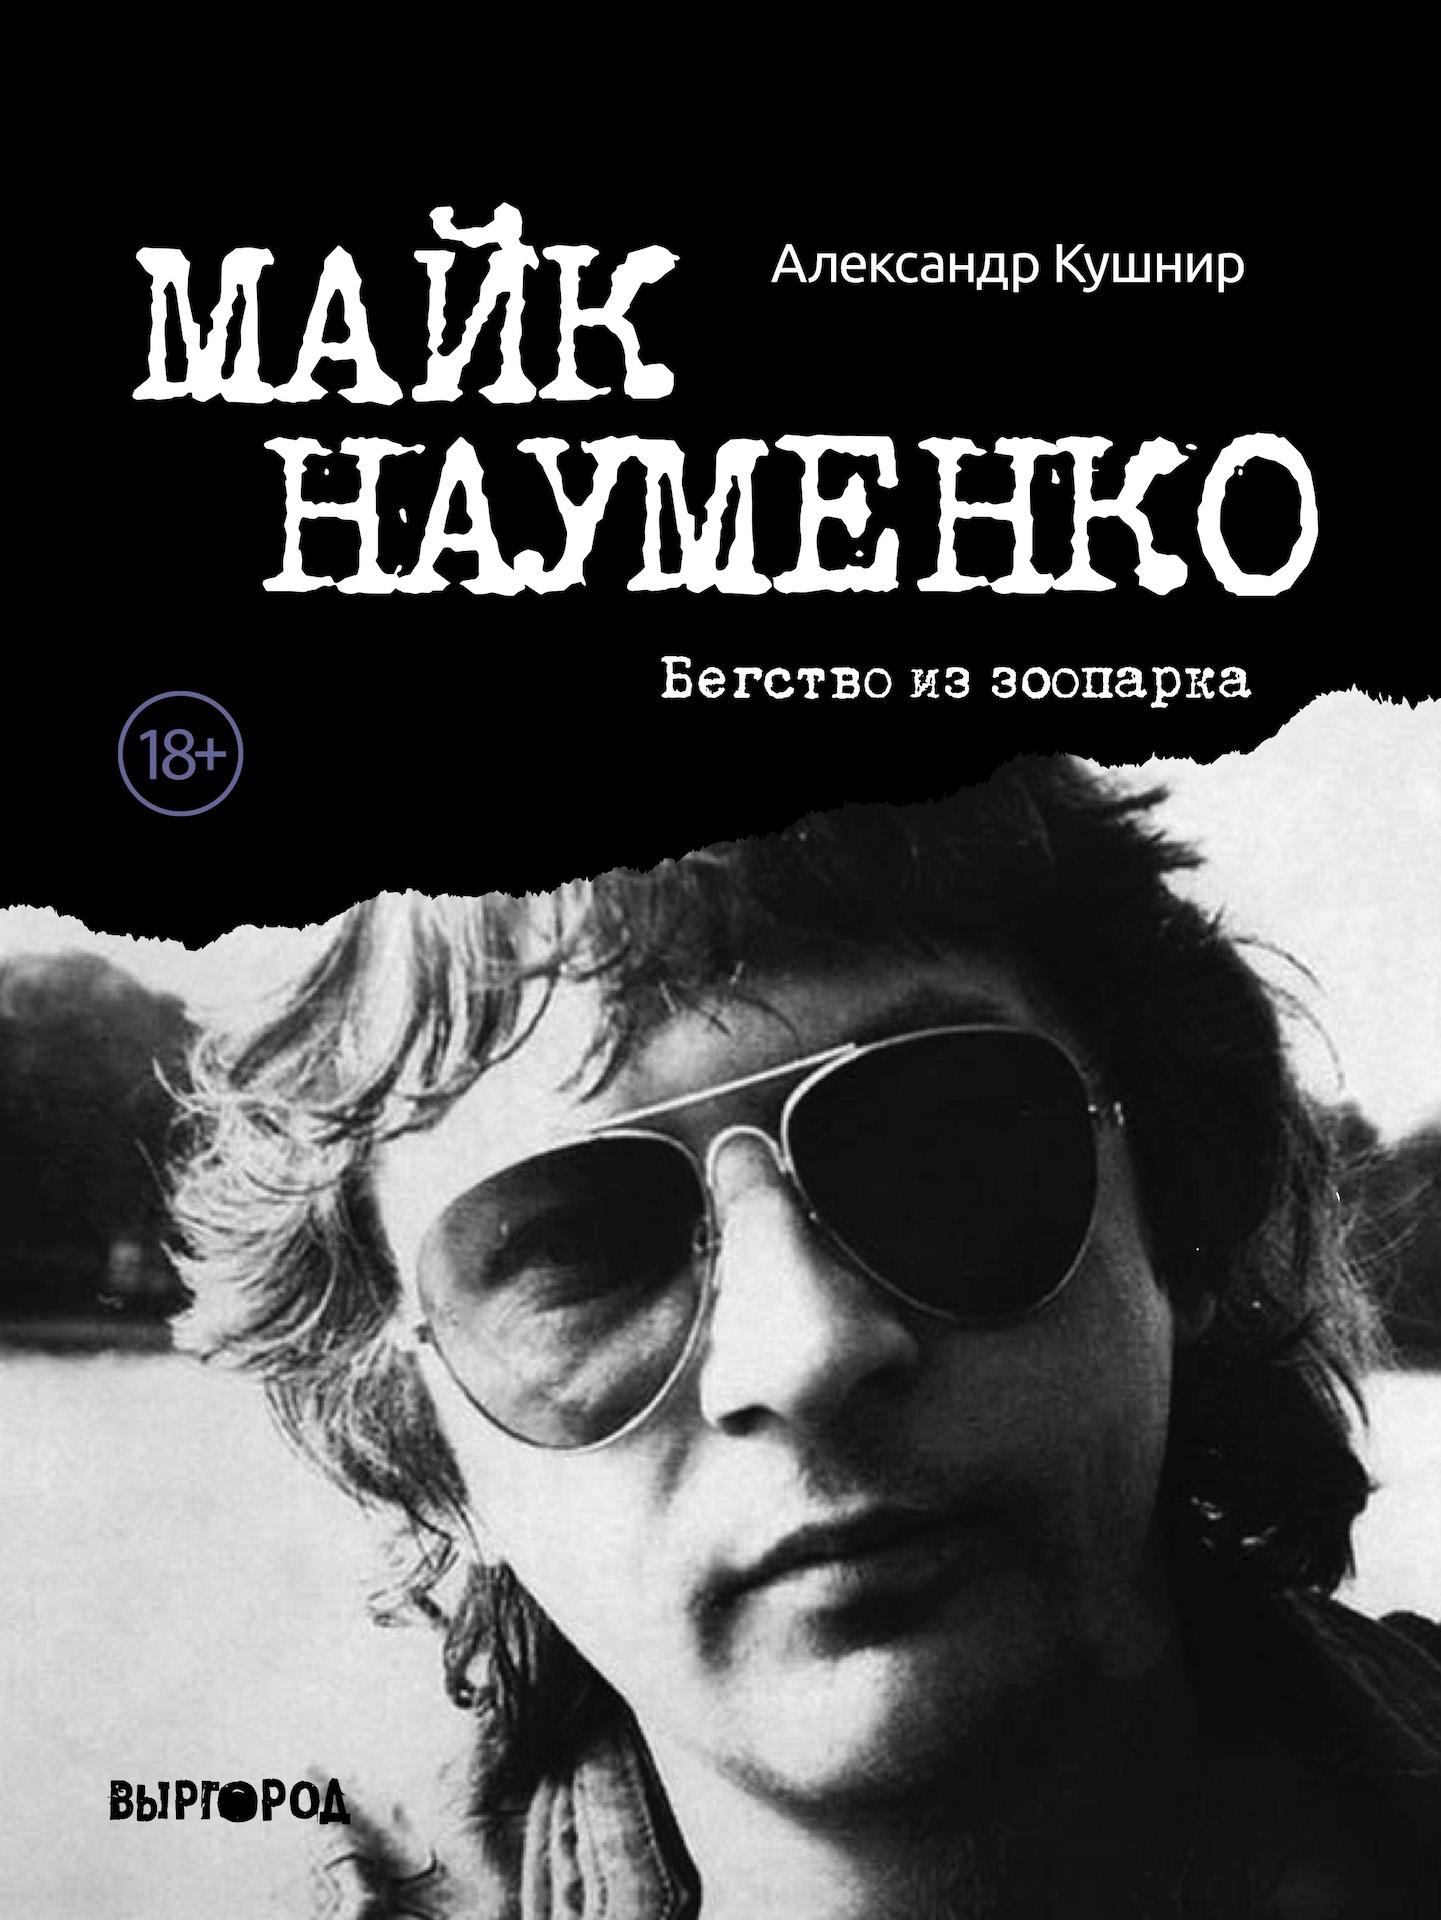 Майк Науменко. Бегство из зоопарка